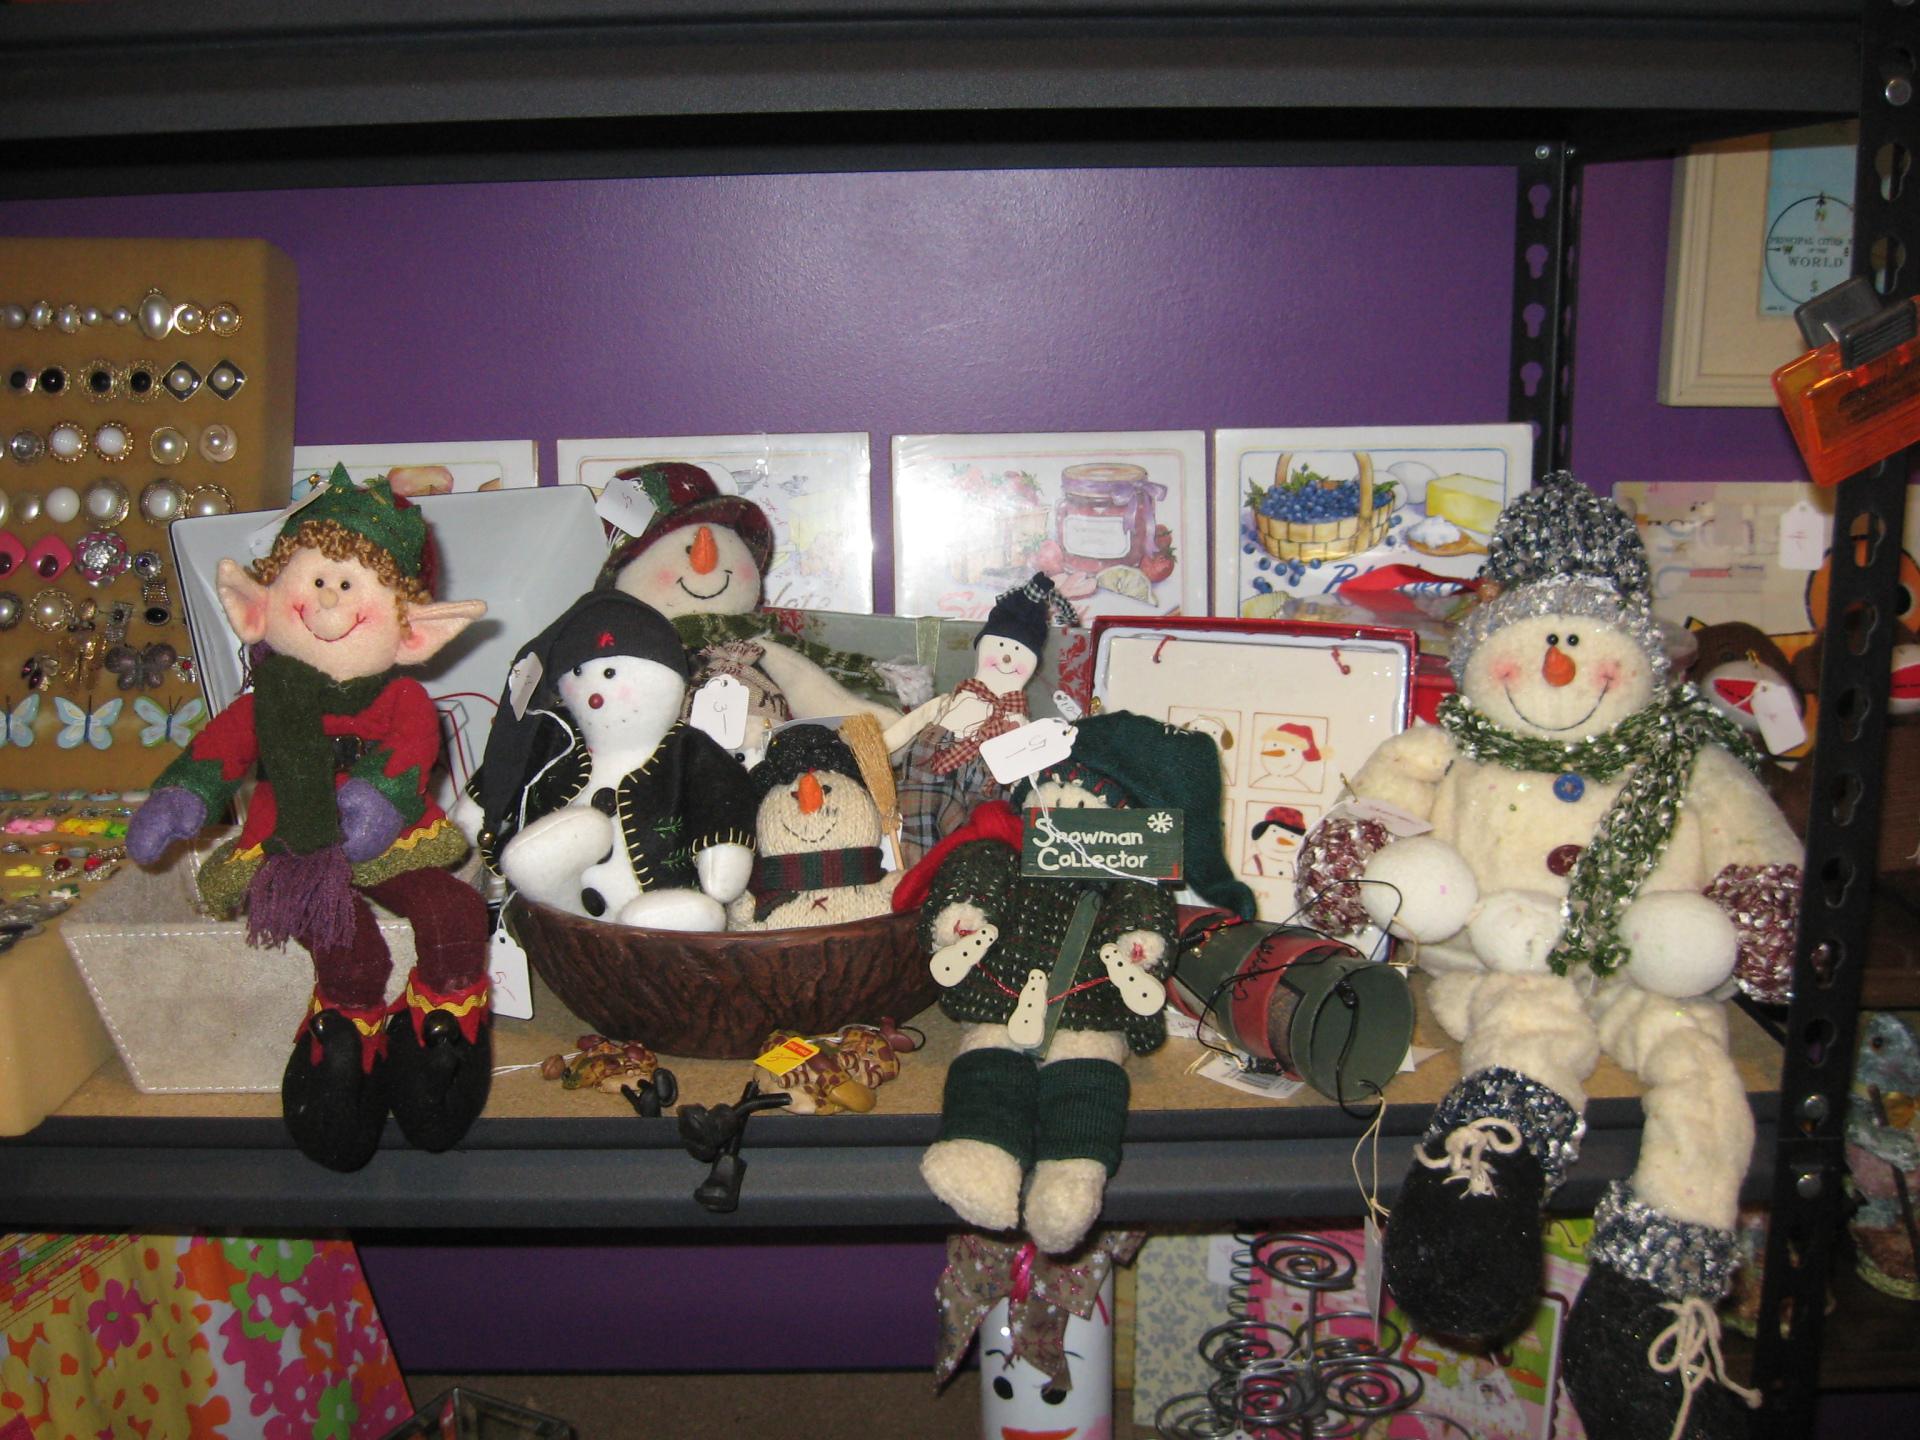 Lots of Snowmen Decorations